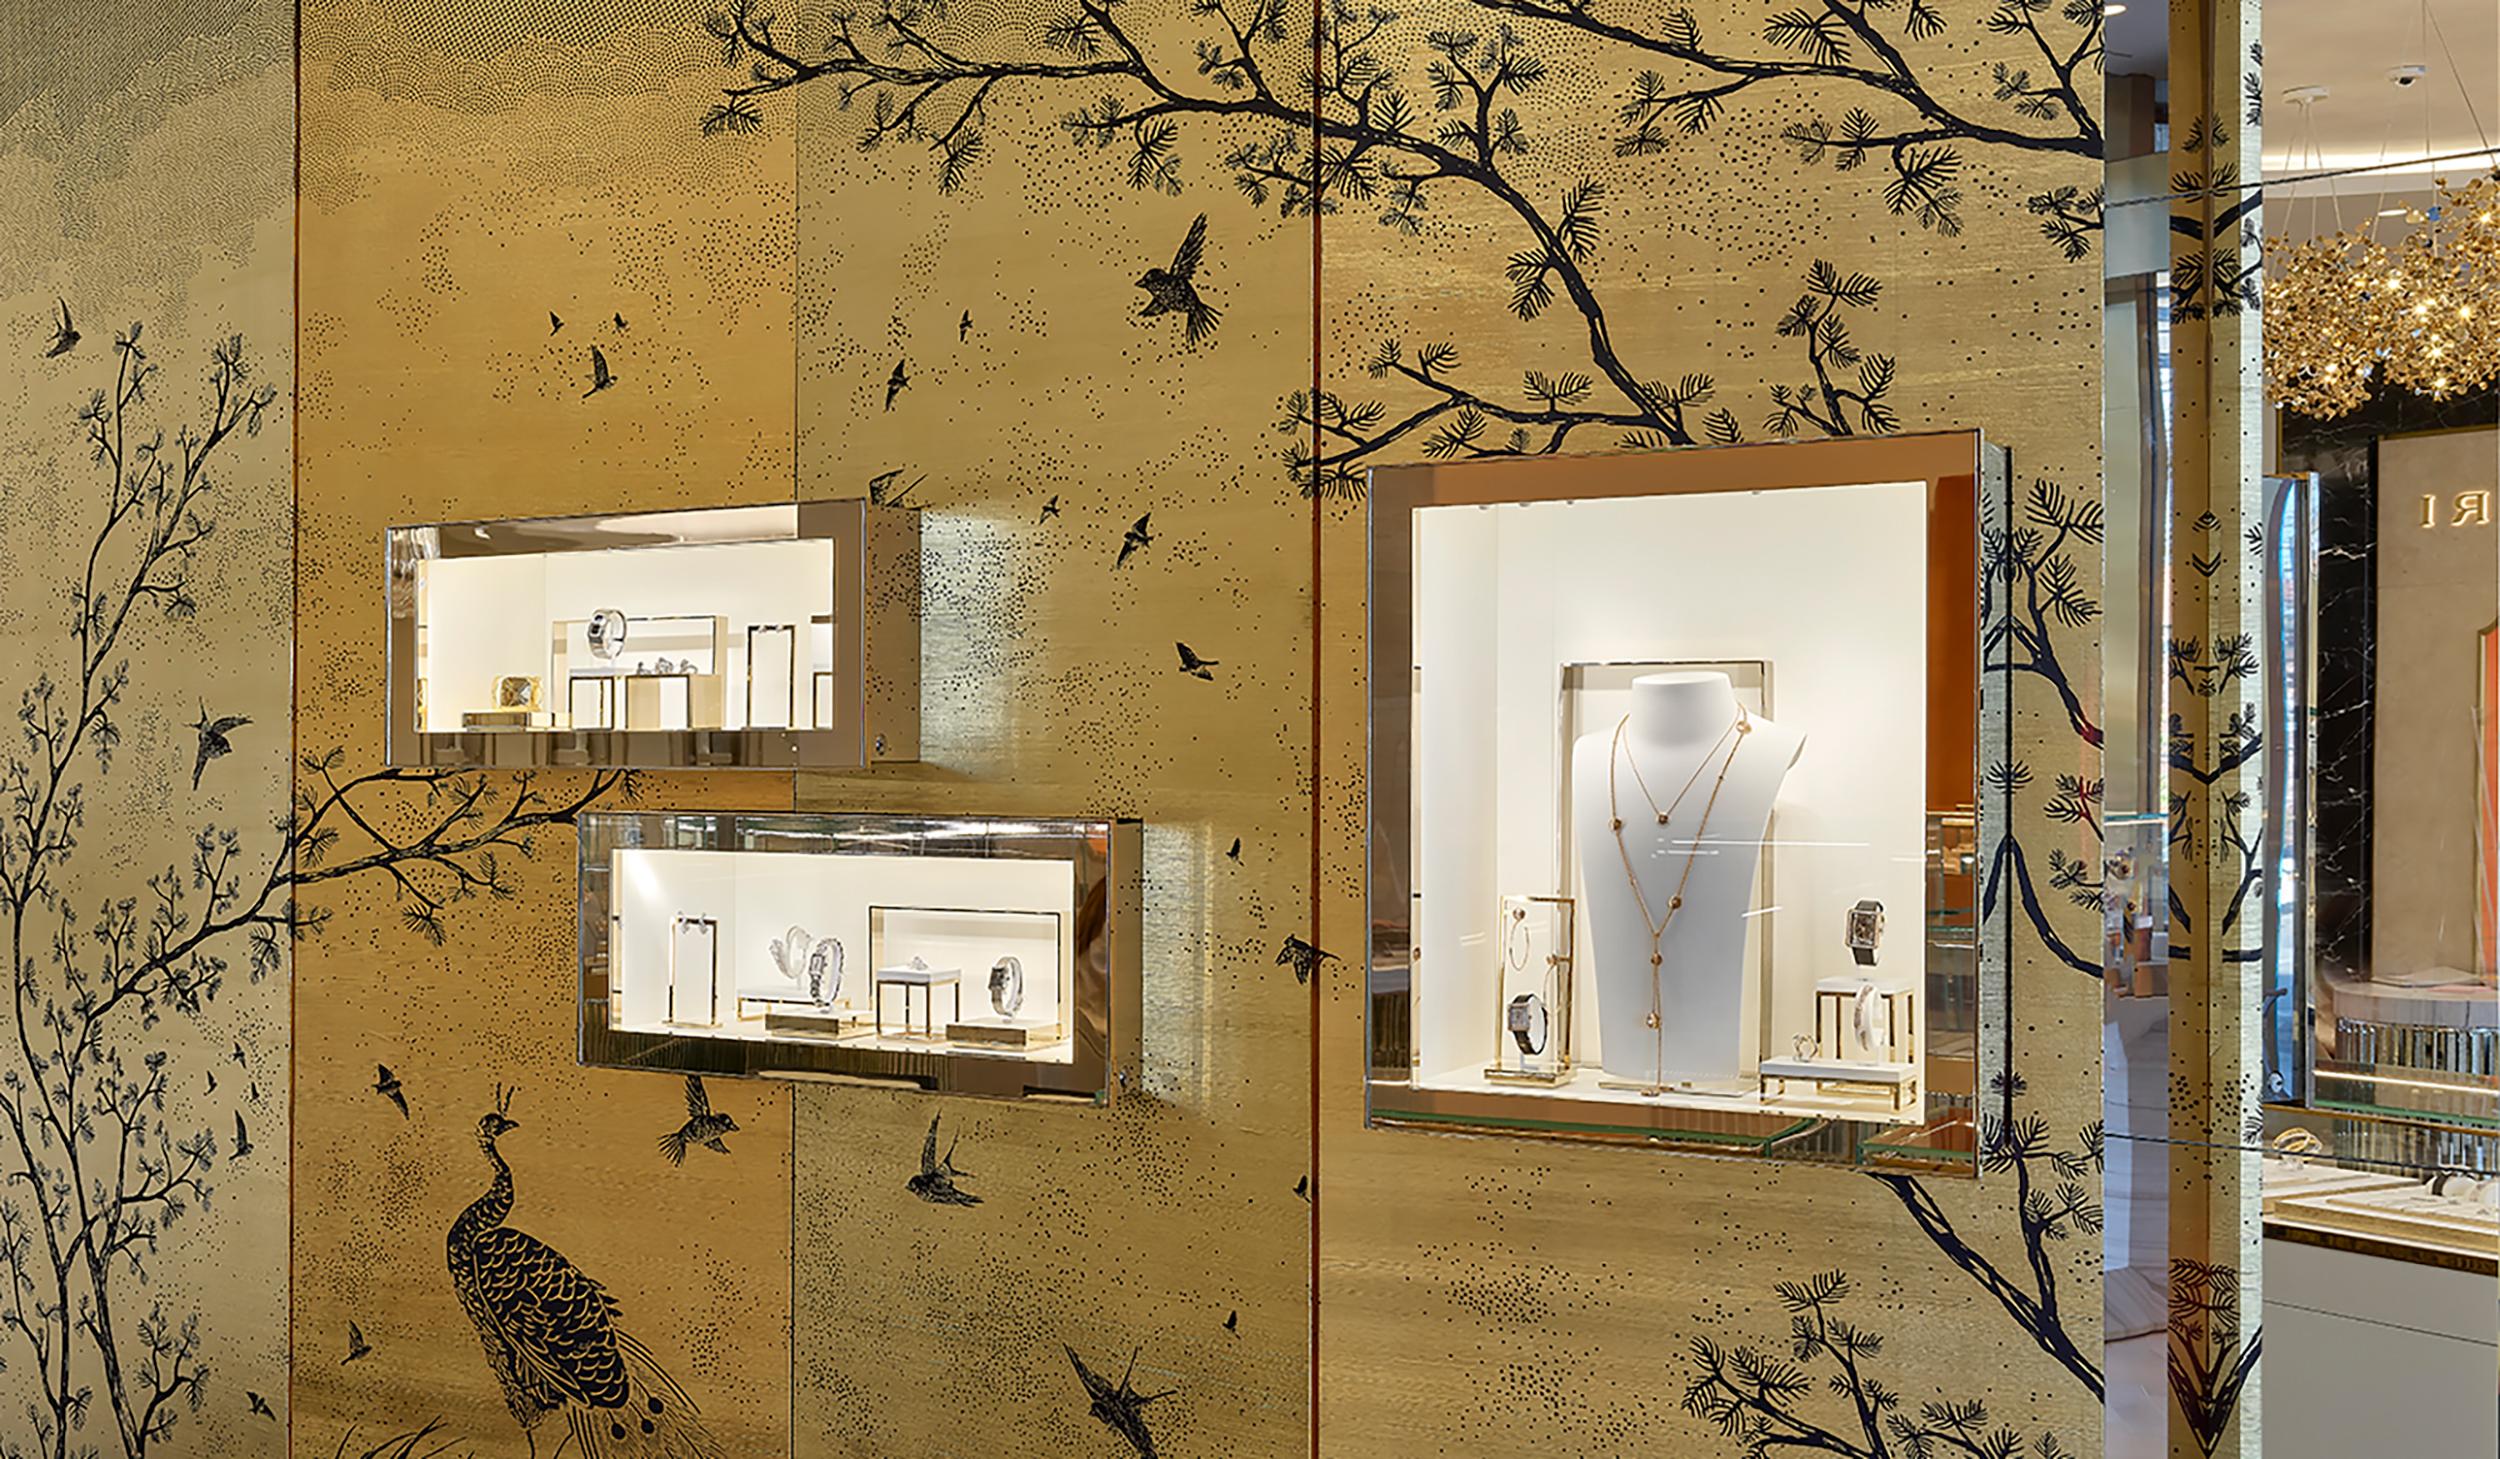 New York's London Jewelers Evokes Paris with Renovation